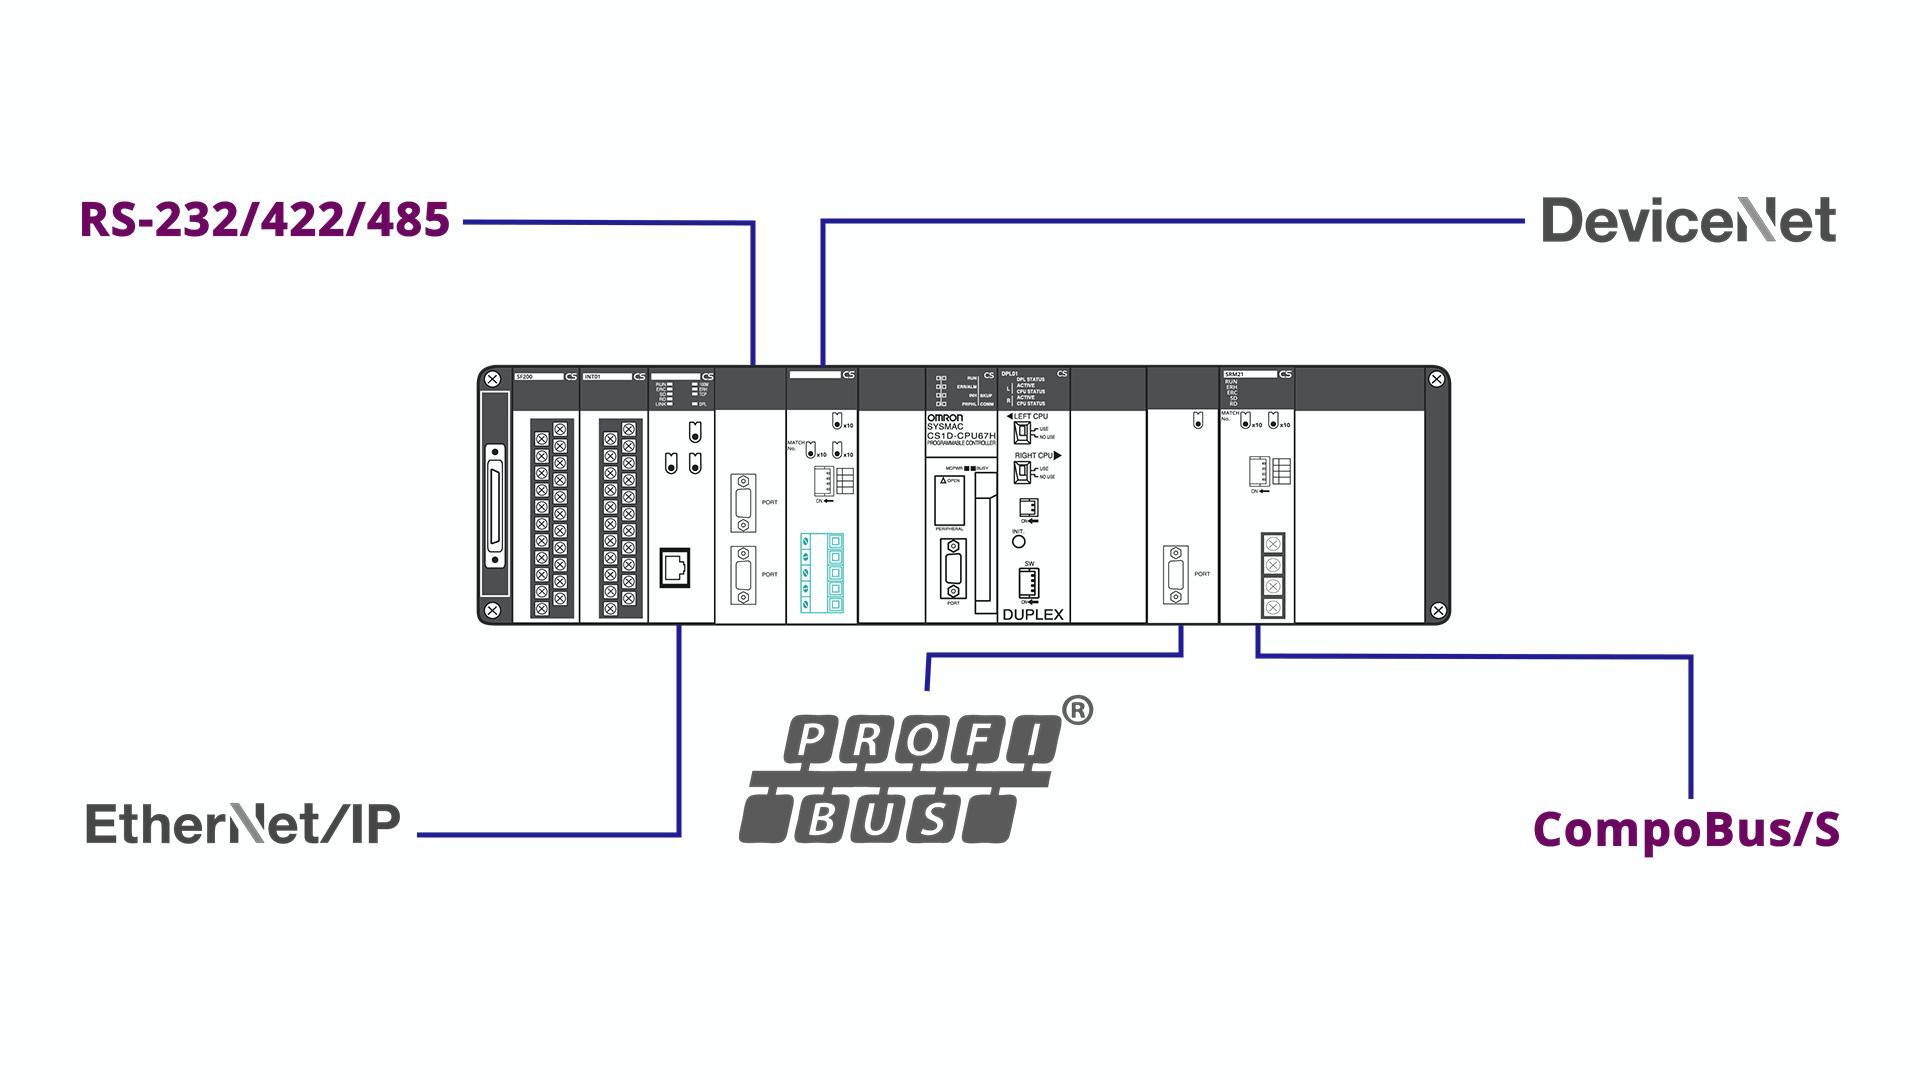 Omron PLC DeviceNet and PROFIBUS-DP